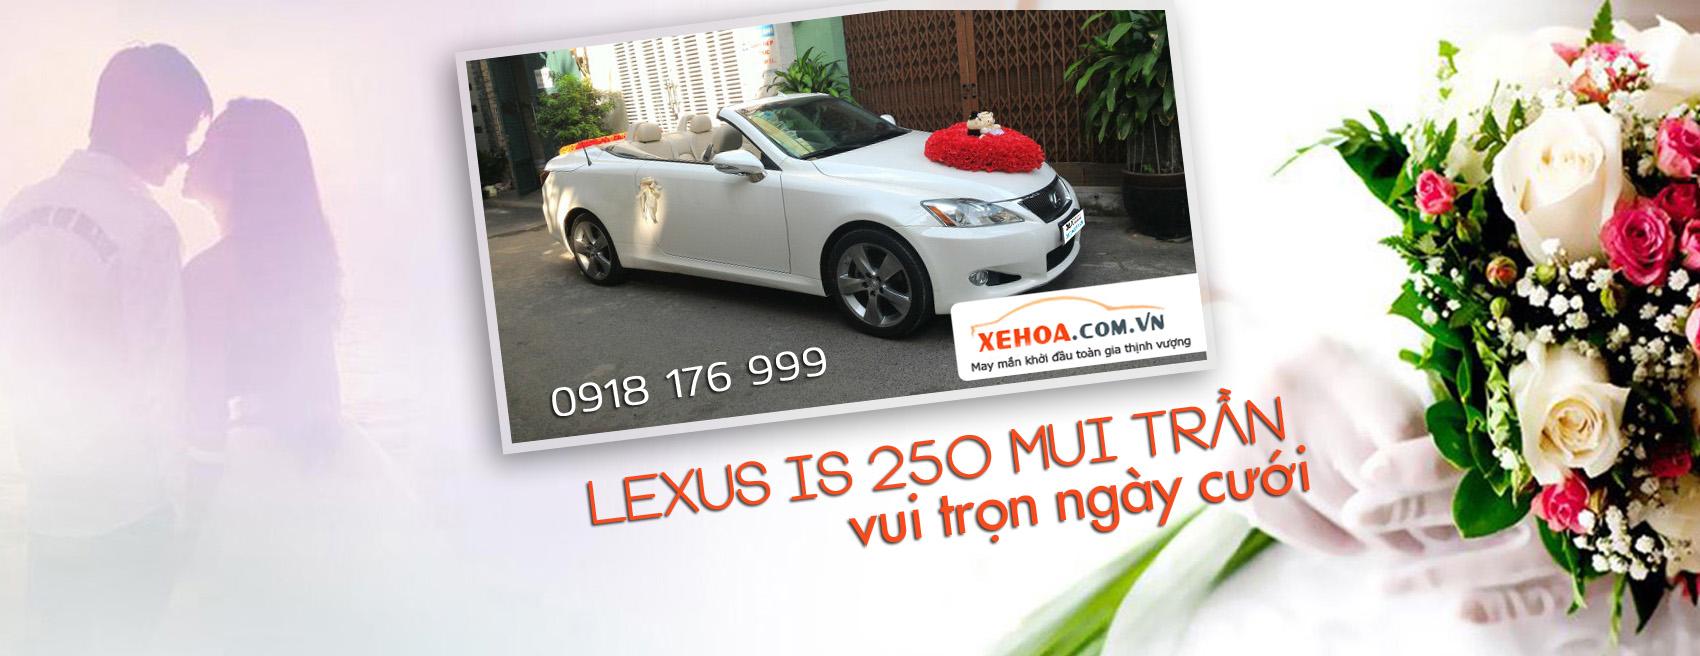 banner-xehoa-lexus